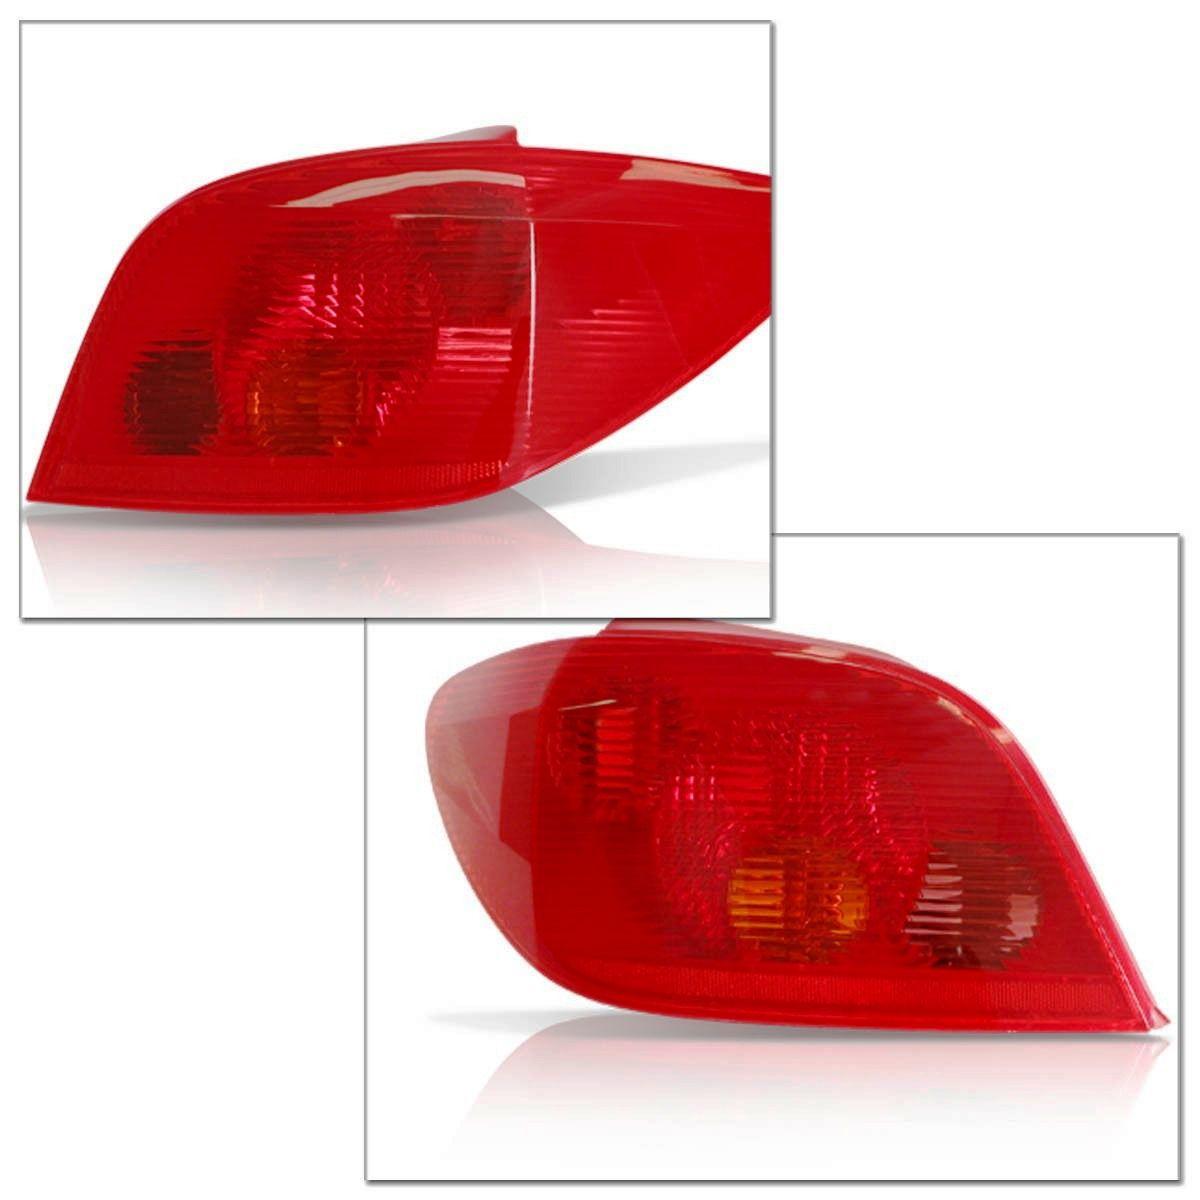 Lanterna Traseira Peugeot 307 2007 2008 2009 2010 2011 2012